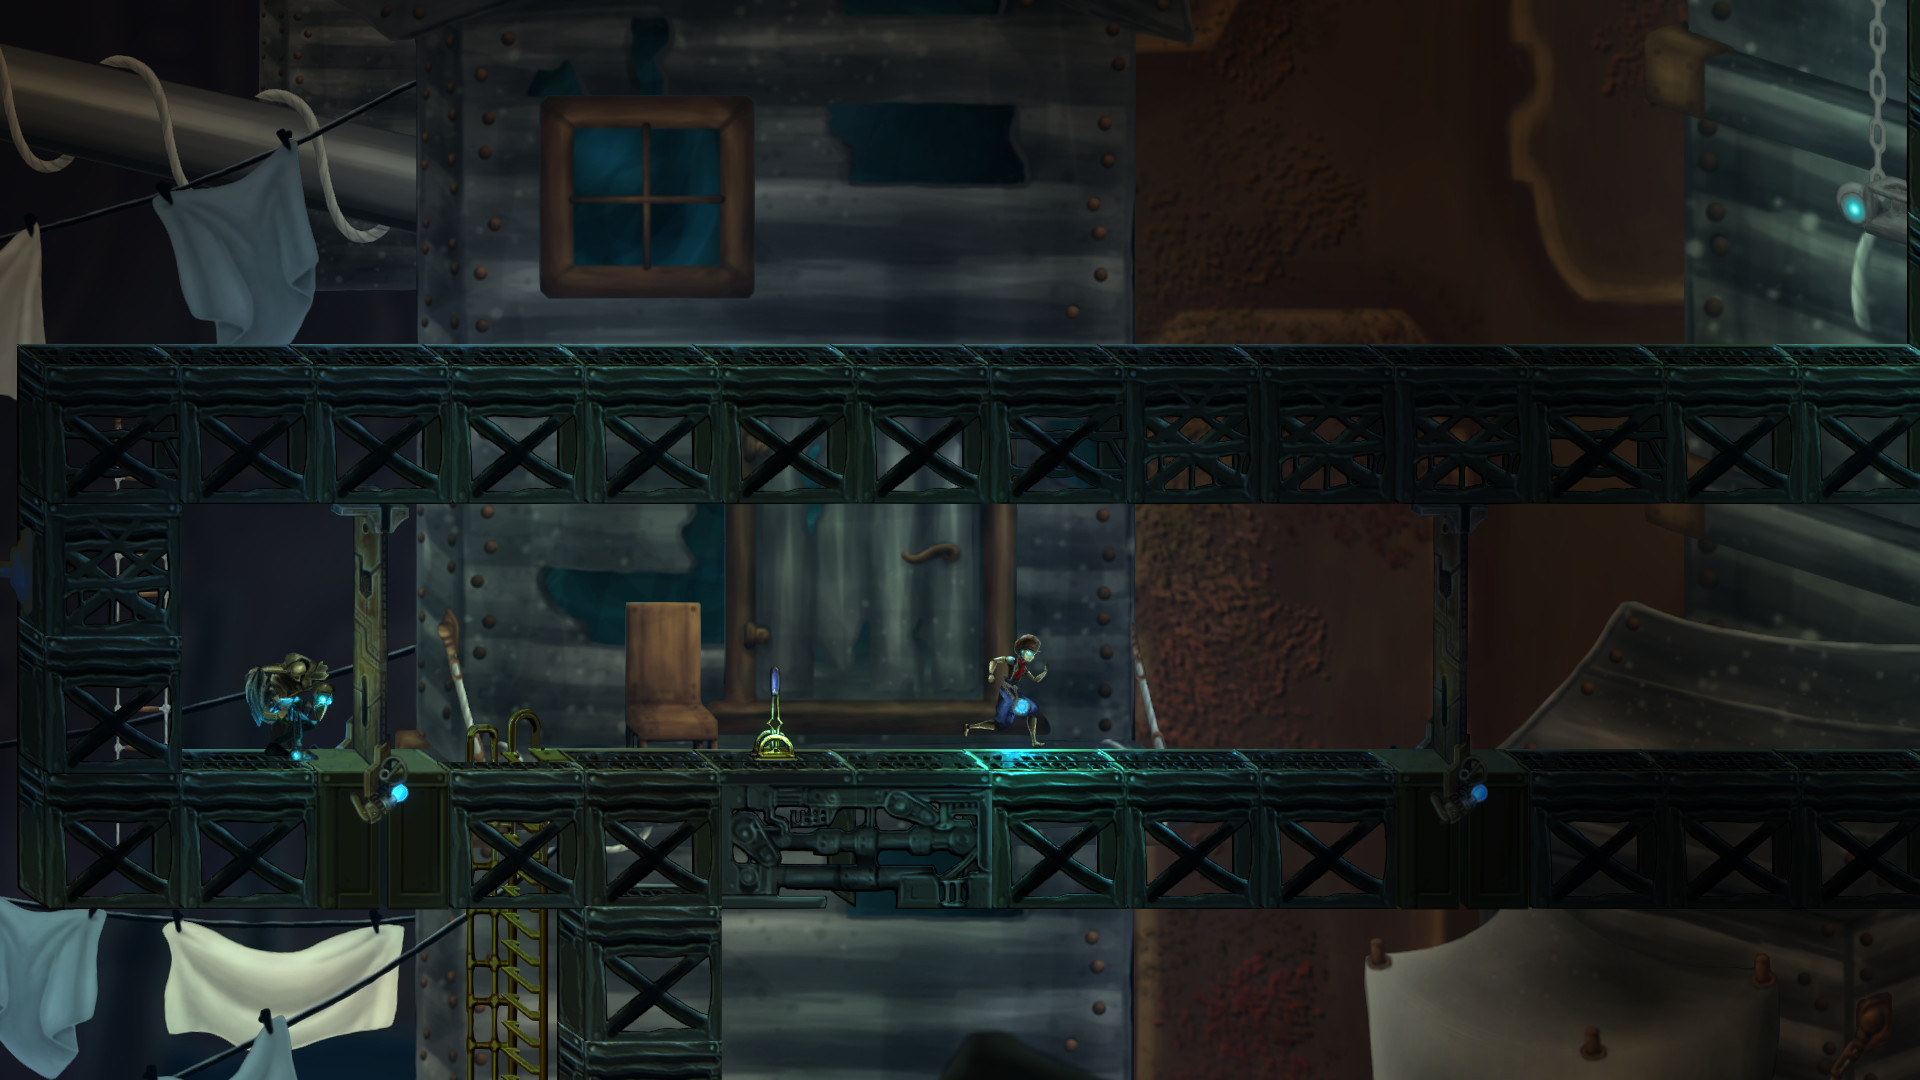 Clockwork Screenshot 3